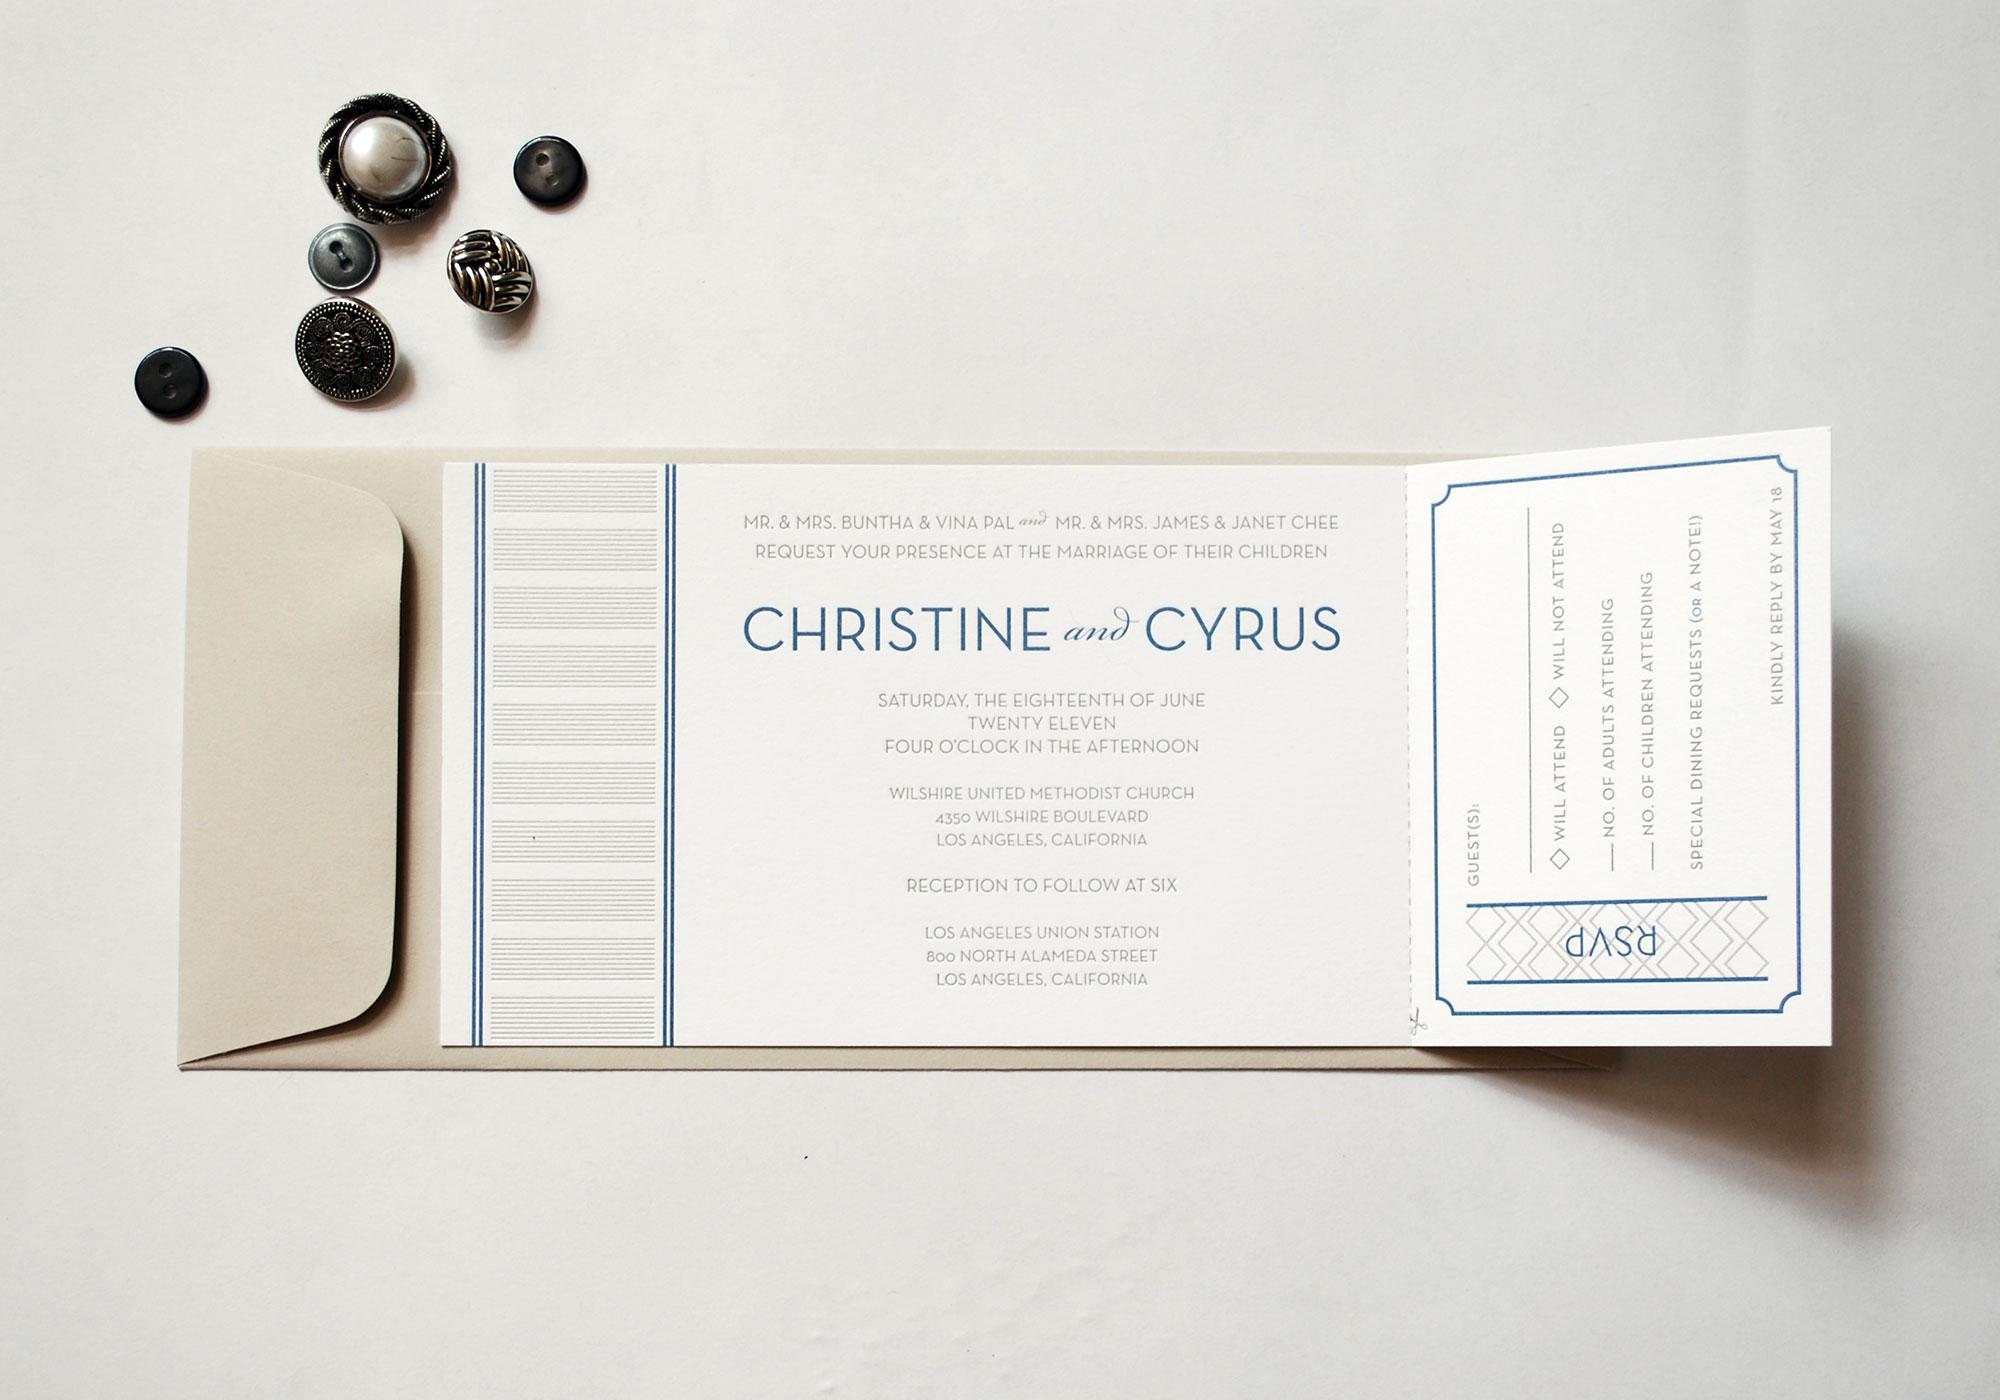 Cyrus_Christine_Invitation.jpg